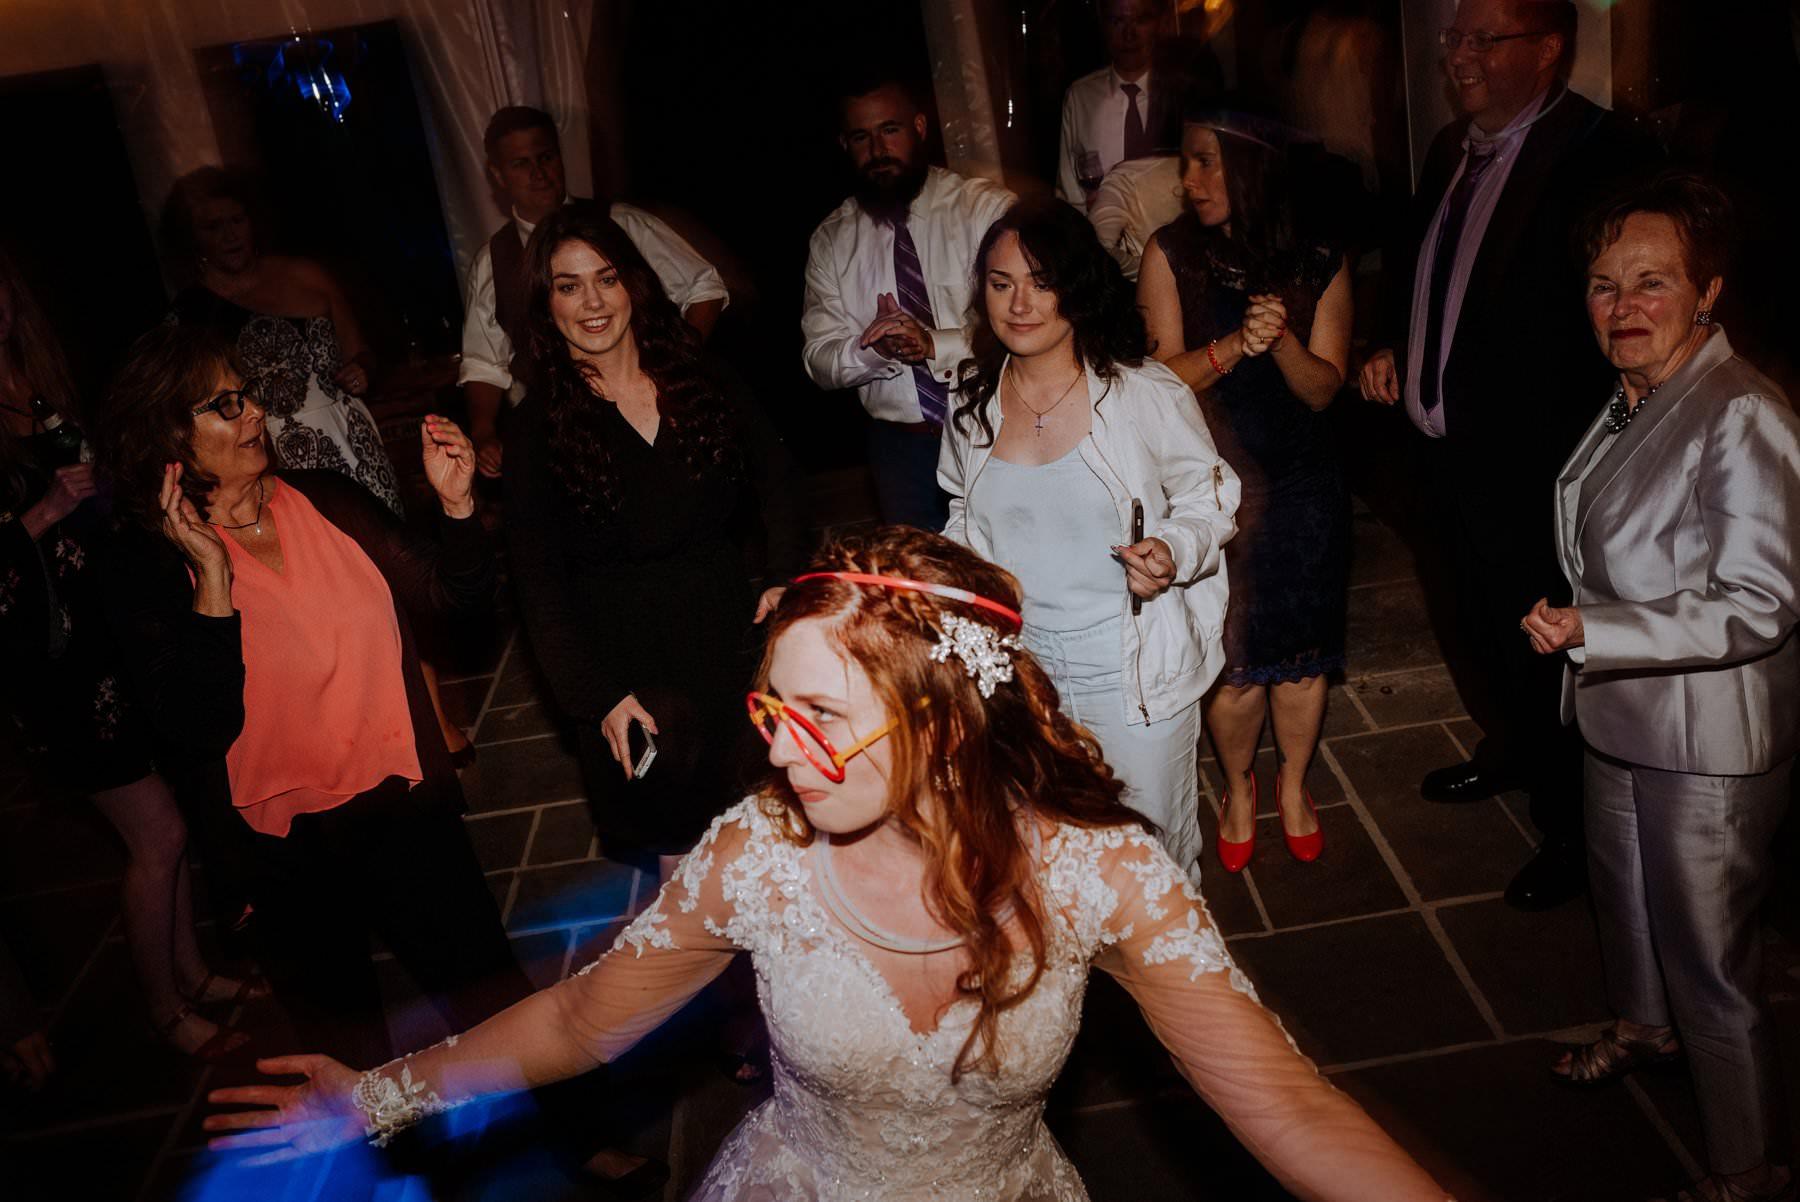 welkinweir-wedding-photography-63.jpg